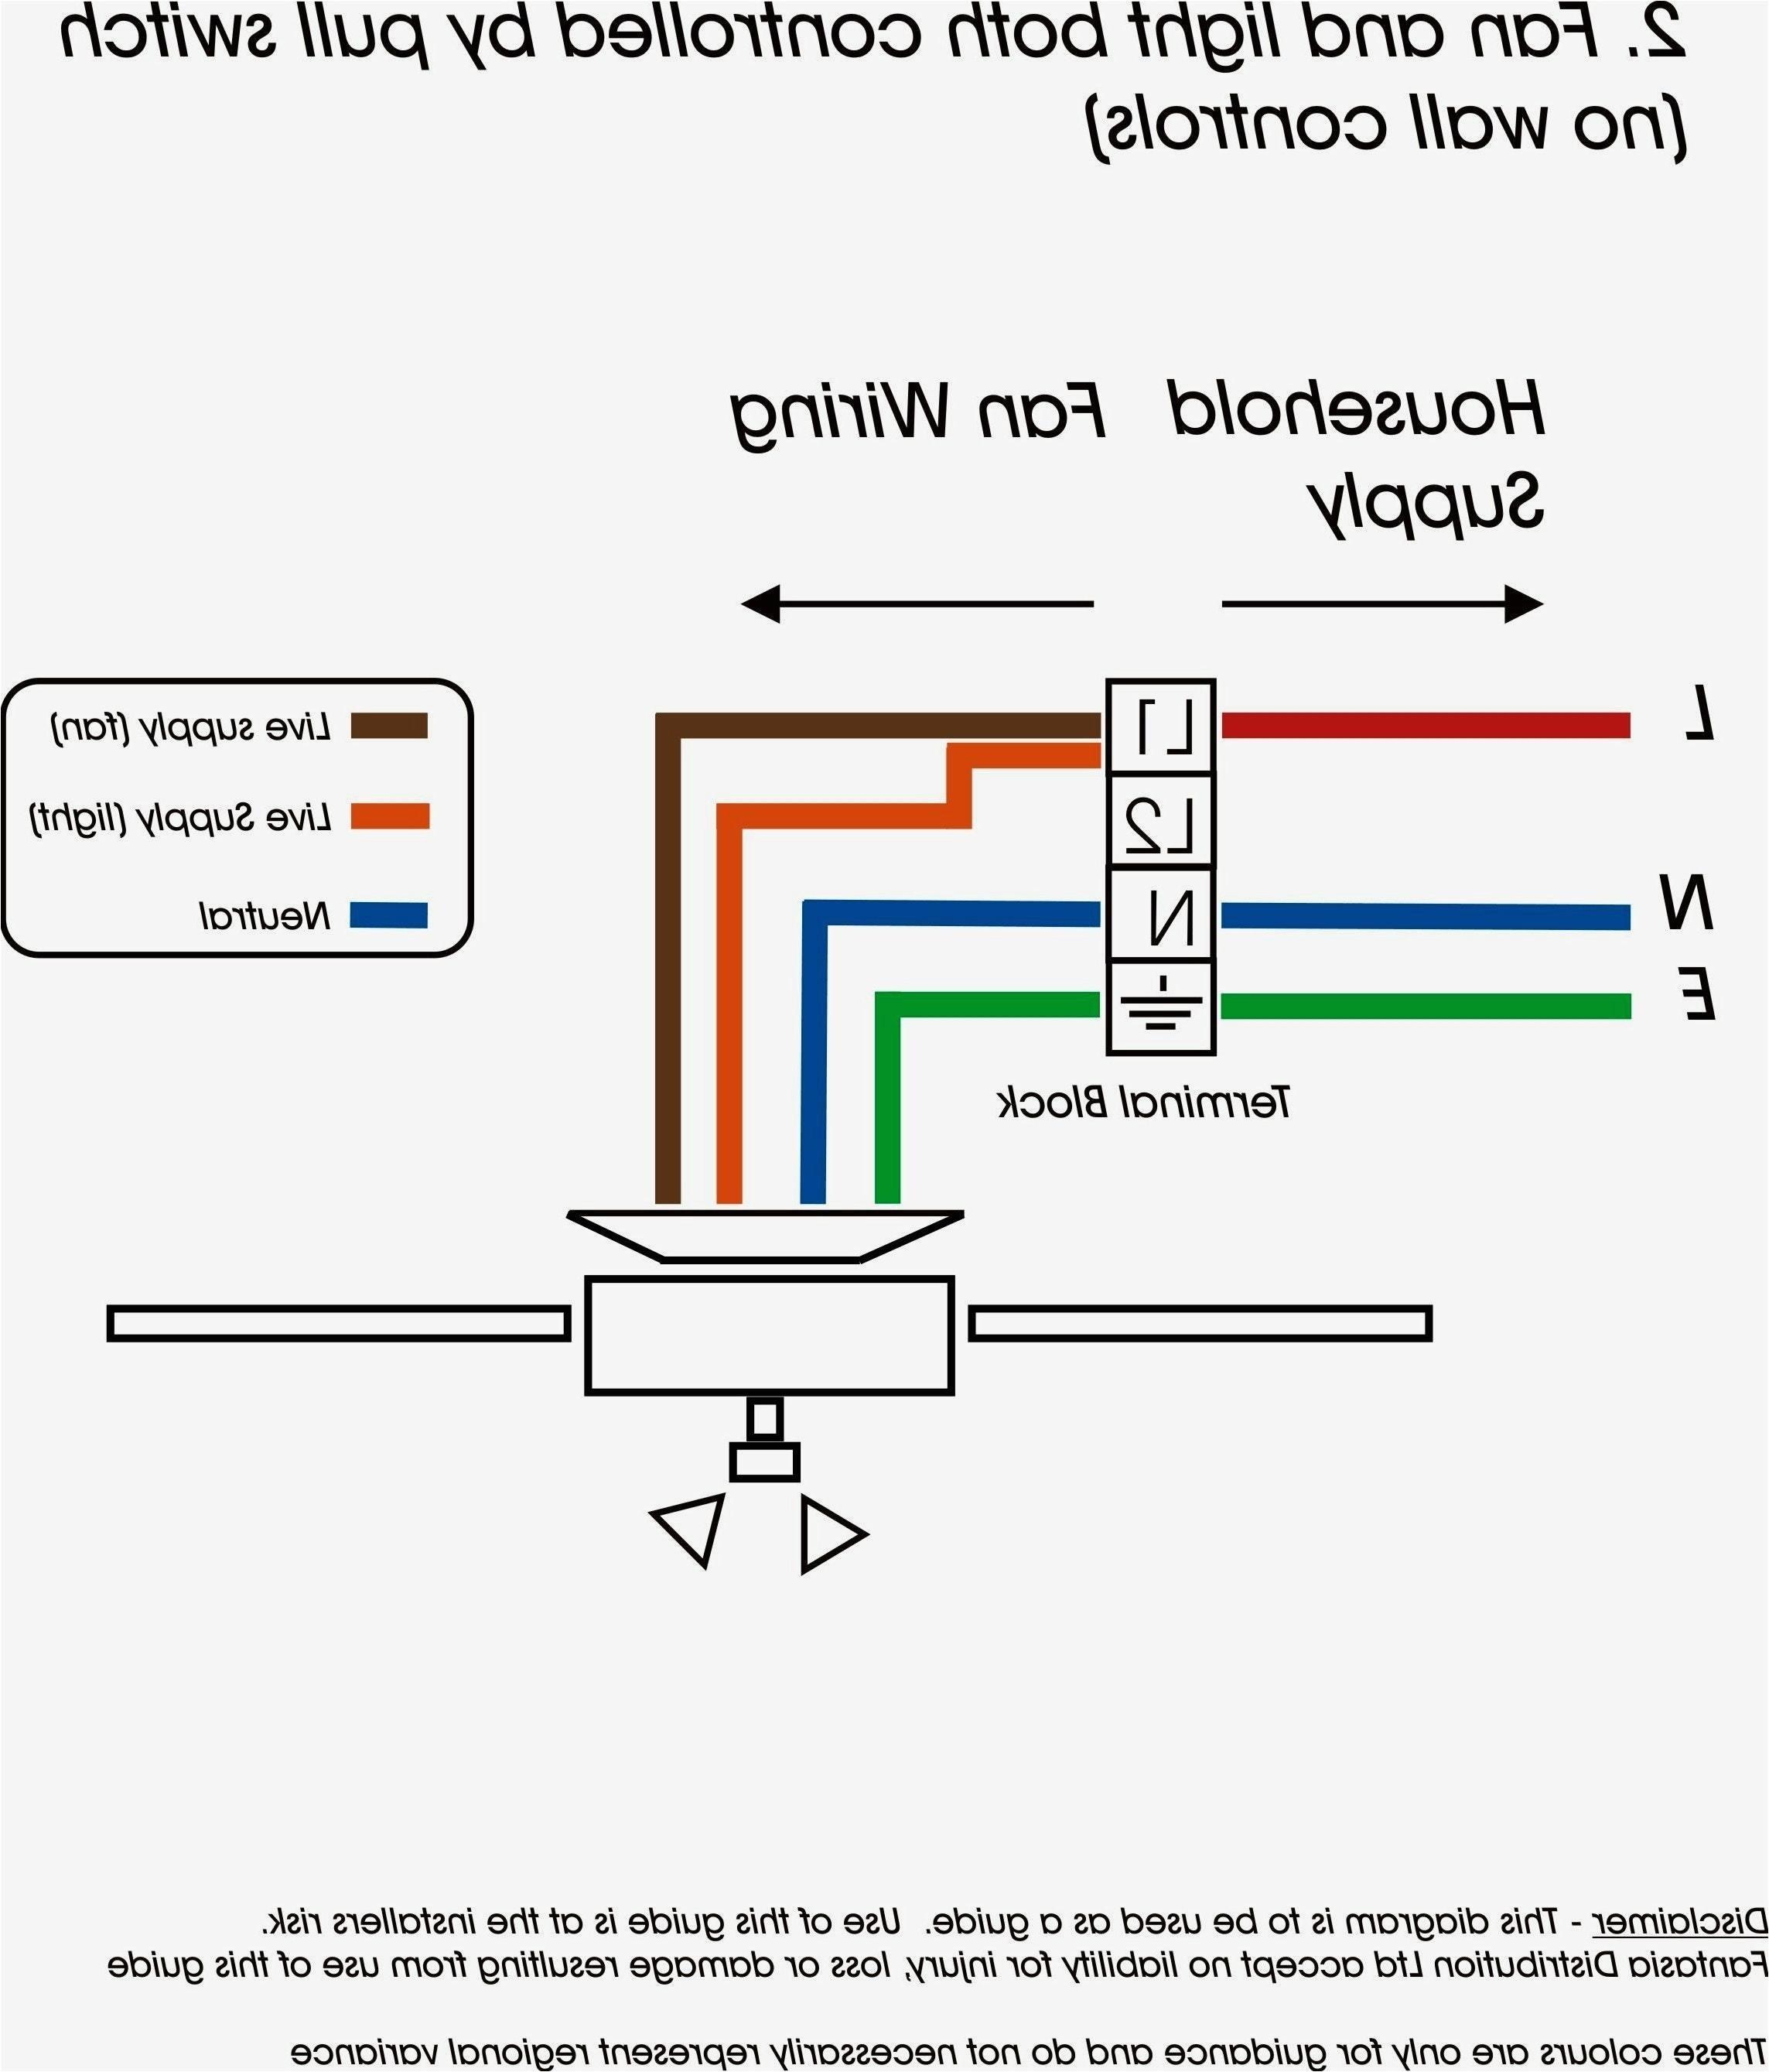 4 wire dc motor diagram wiring diagram namedc motor wiring diagram 3 wire wiring diagram show